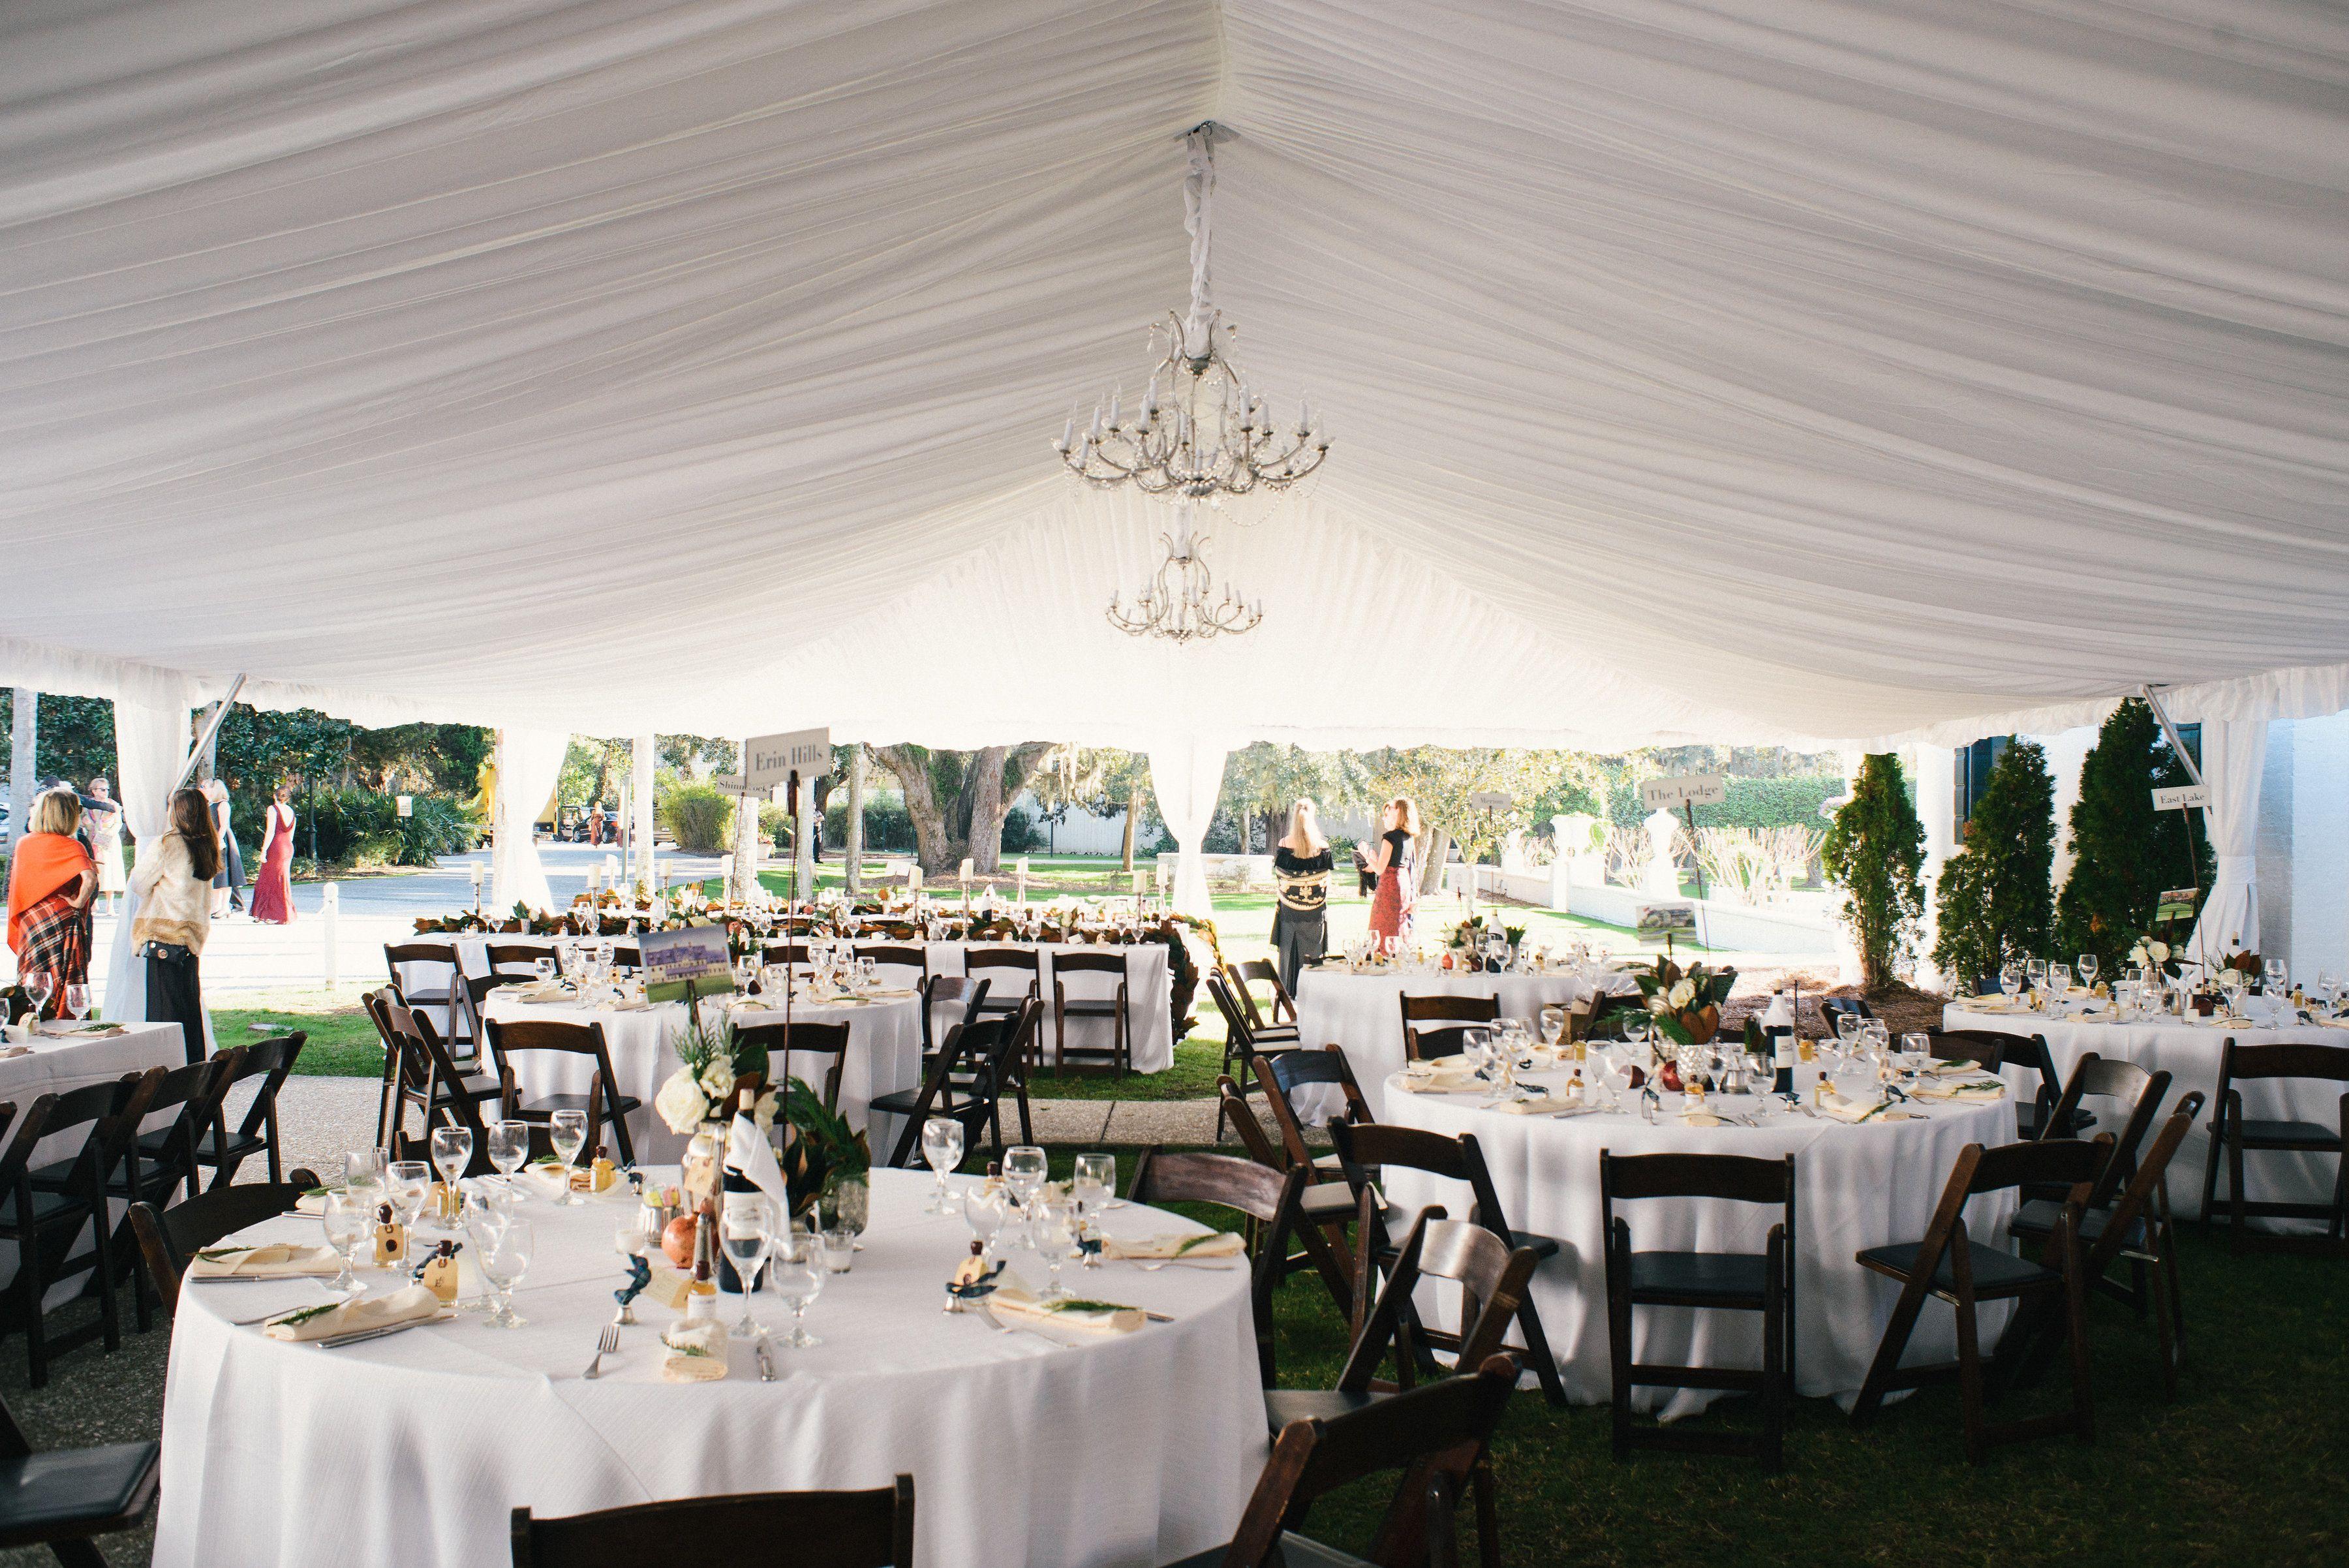 Crane Cottage Tent Reception Georgia Wedding Tent Reception Dream Destination Wedding